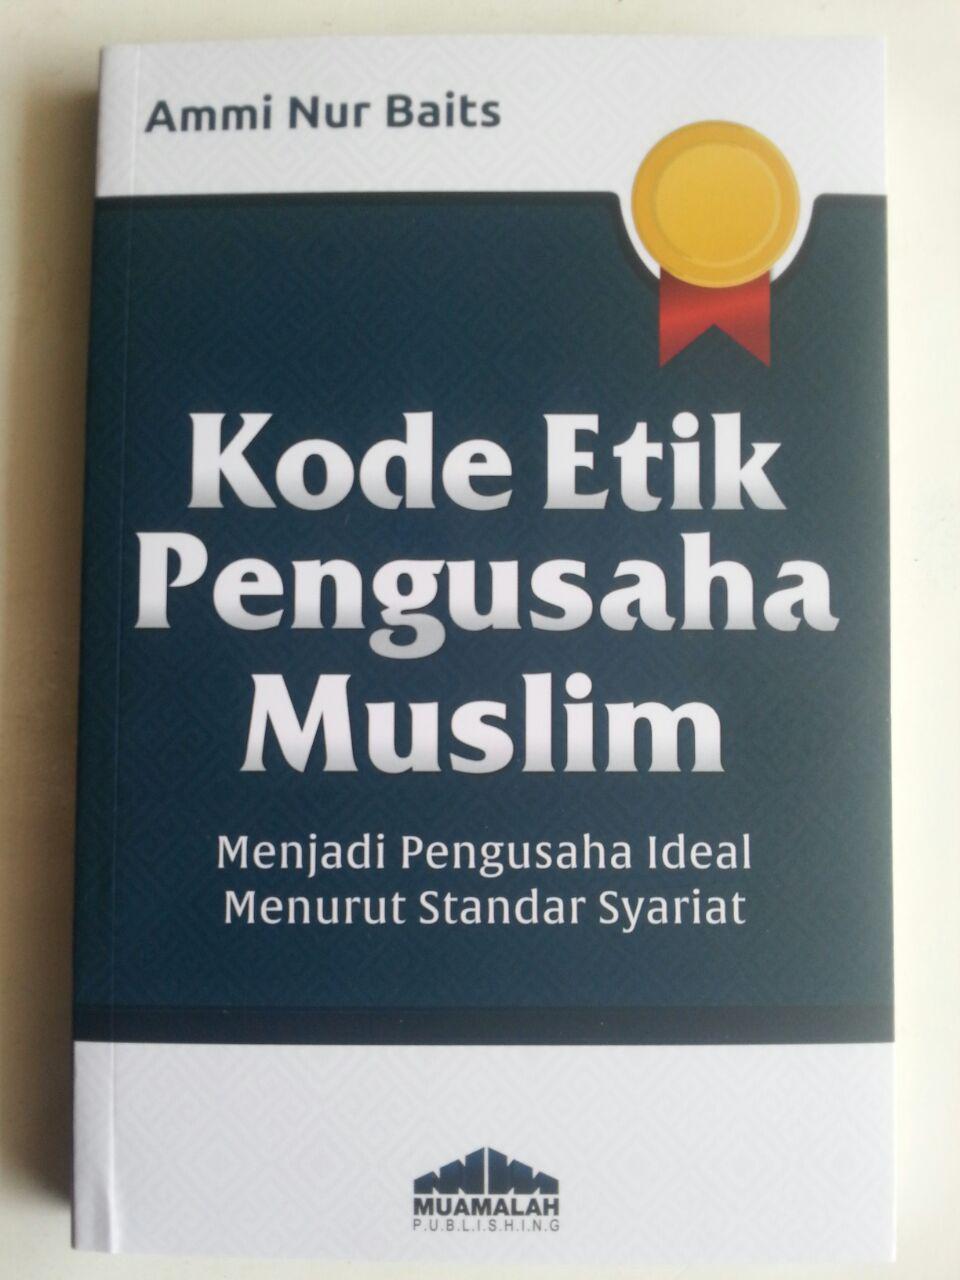 Buku Kode Etik Pengusaha Muslim Menjadi Pengusaha Ideal Standar Syariat cover 2